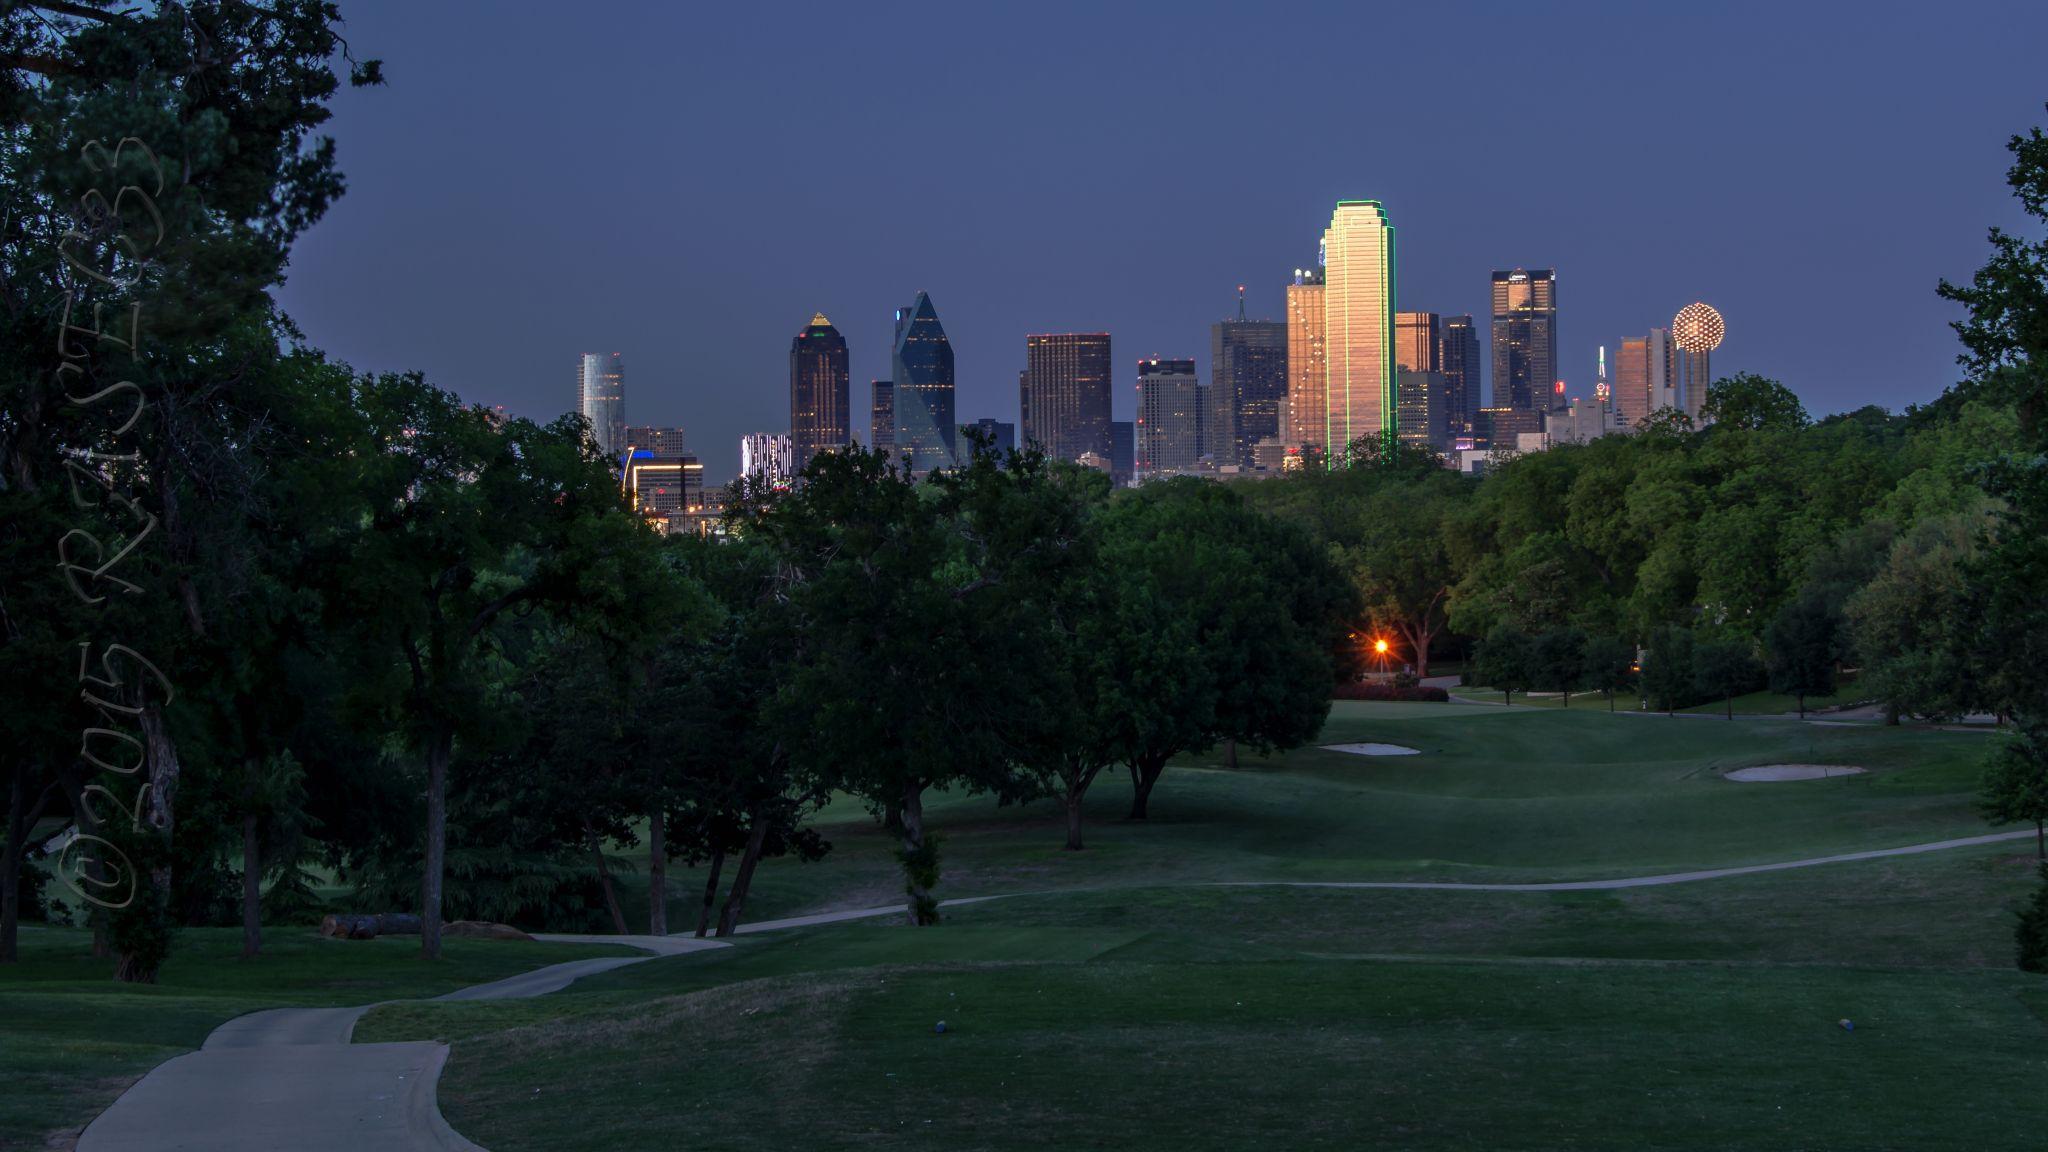 Dallas viewed from Kessler Park, USA